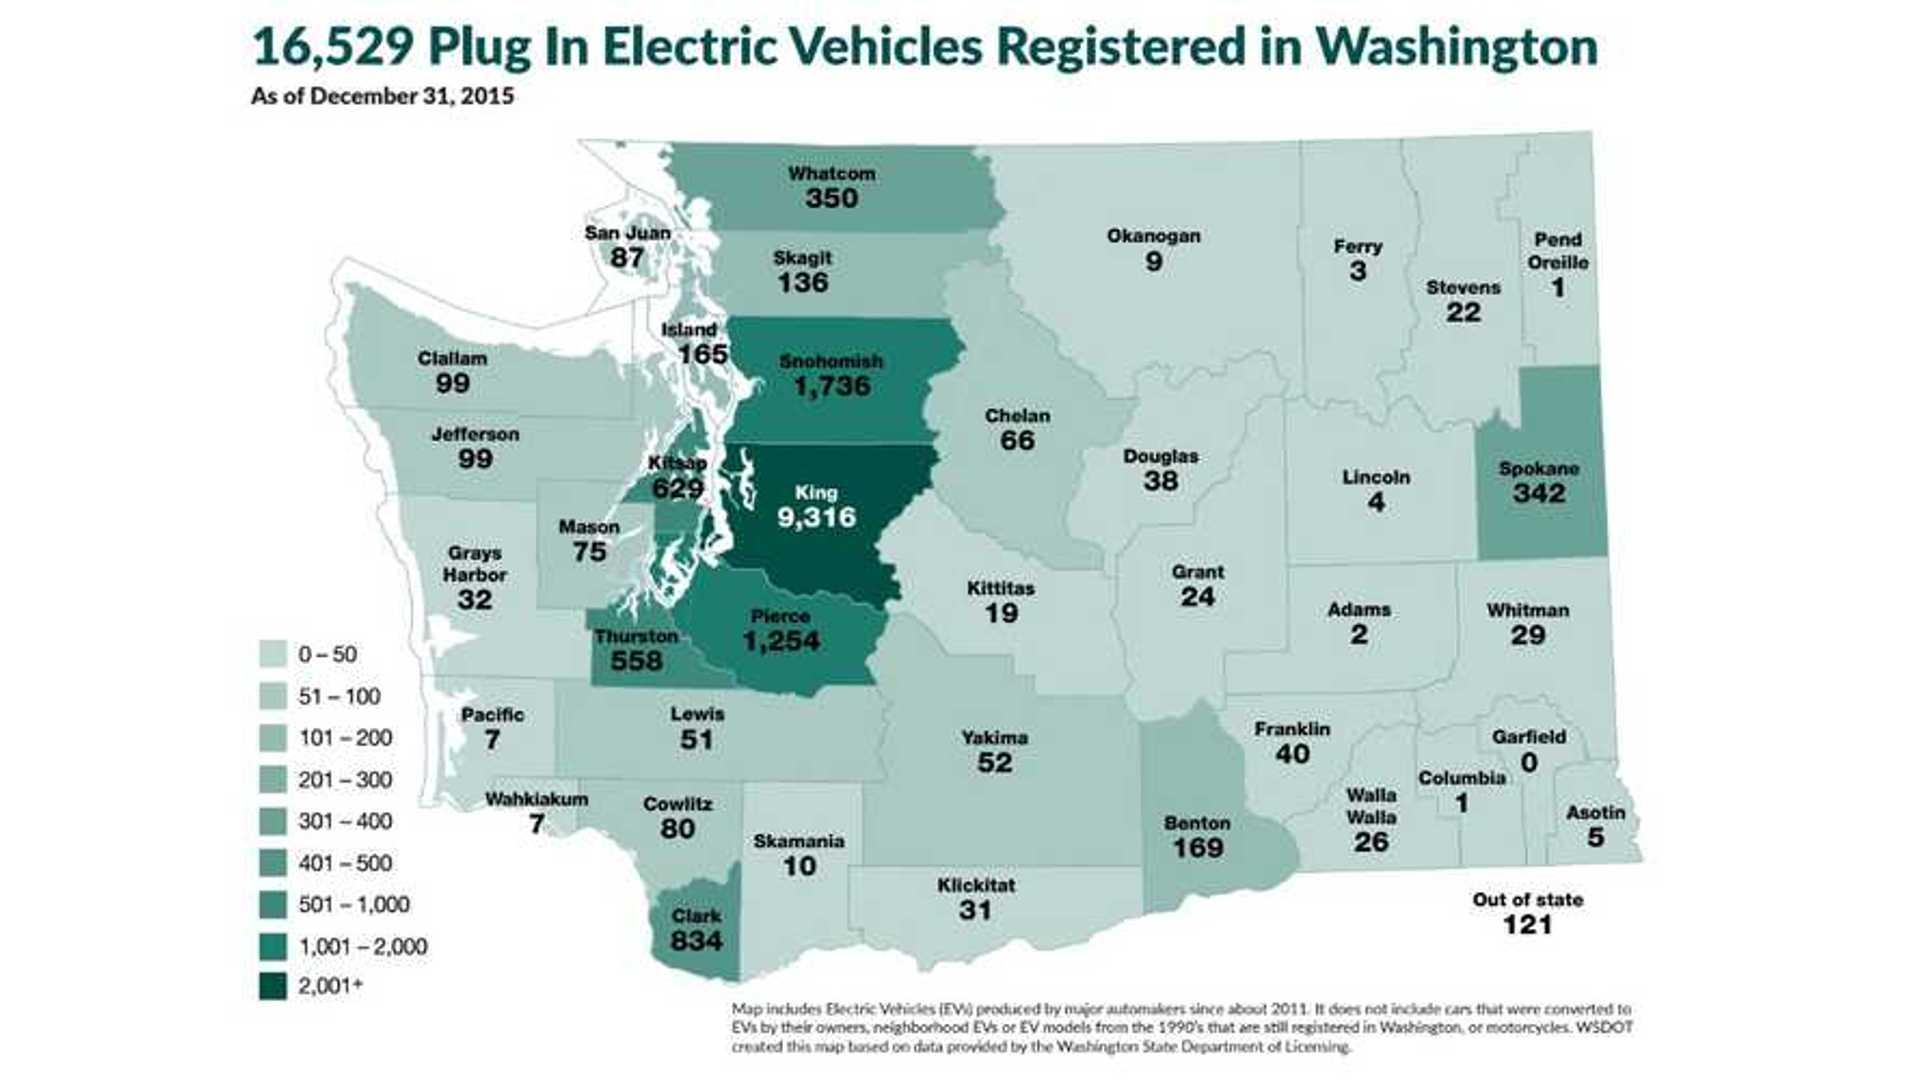 Washington Expands Electric Vehicle Incentive Program S Up To 3 100